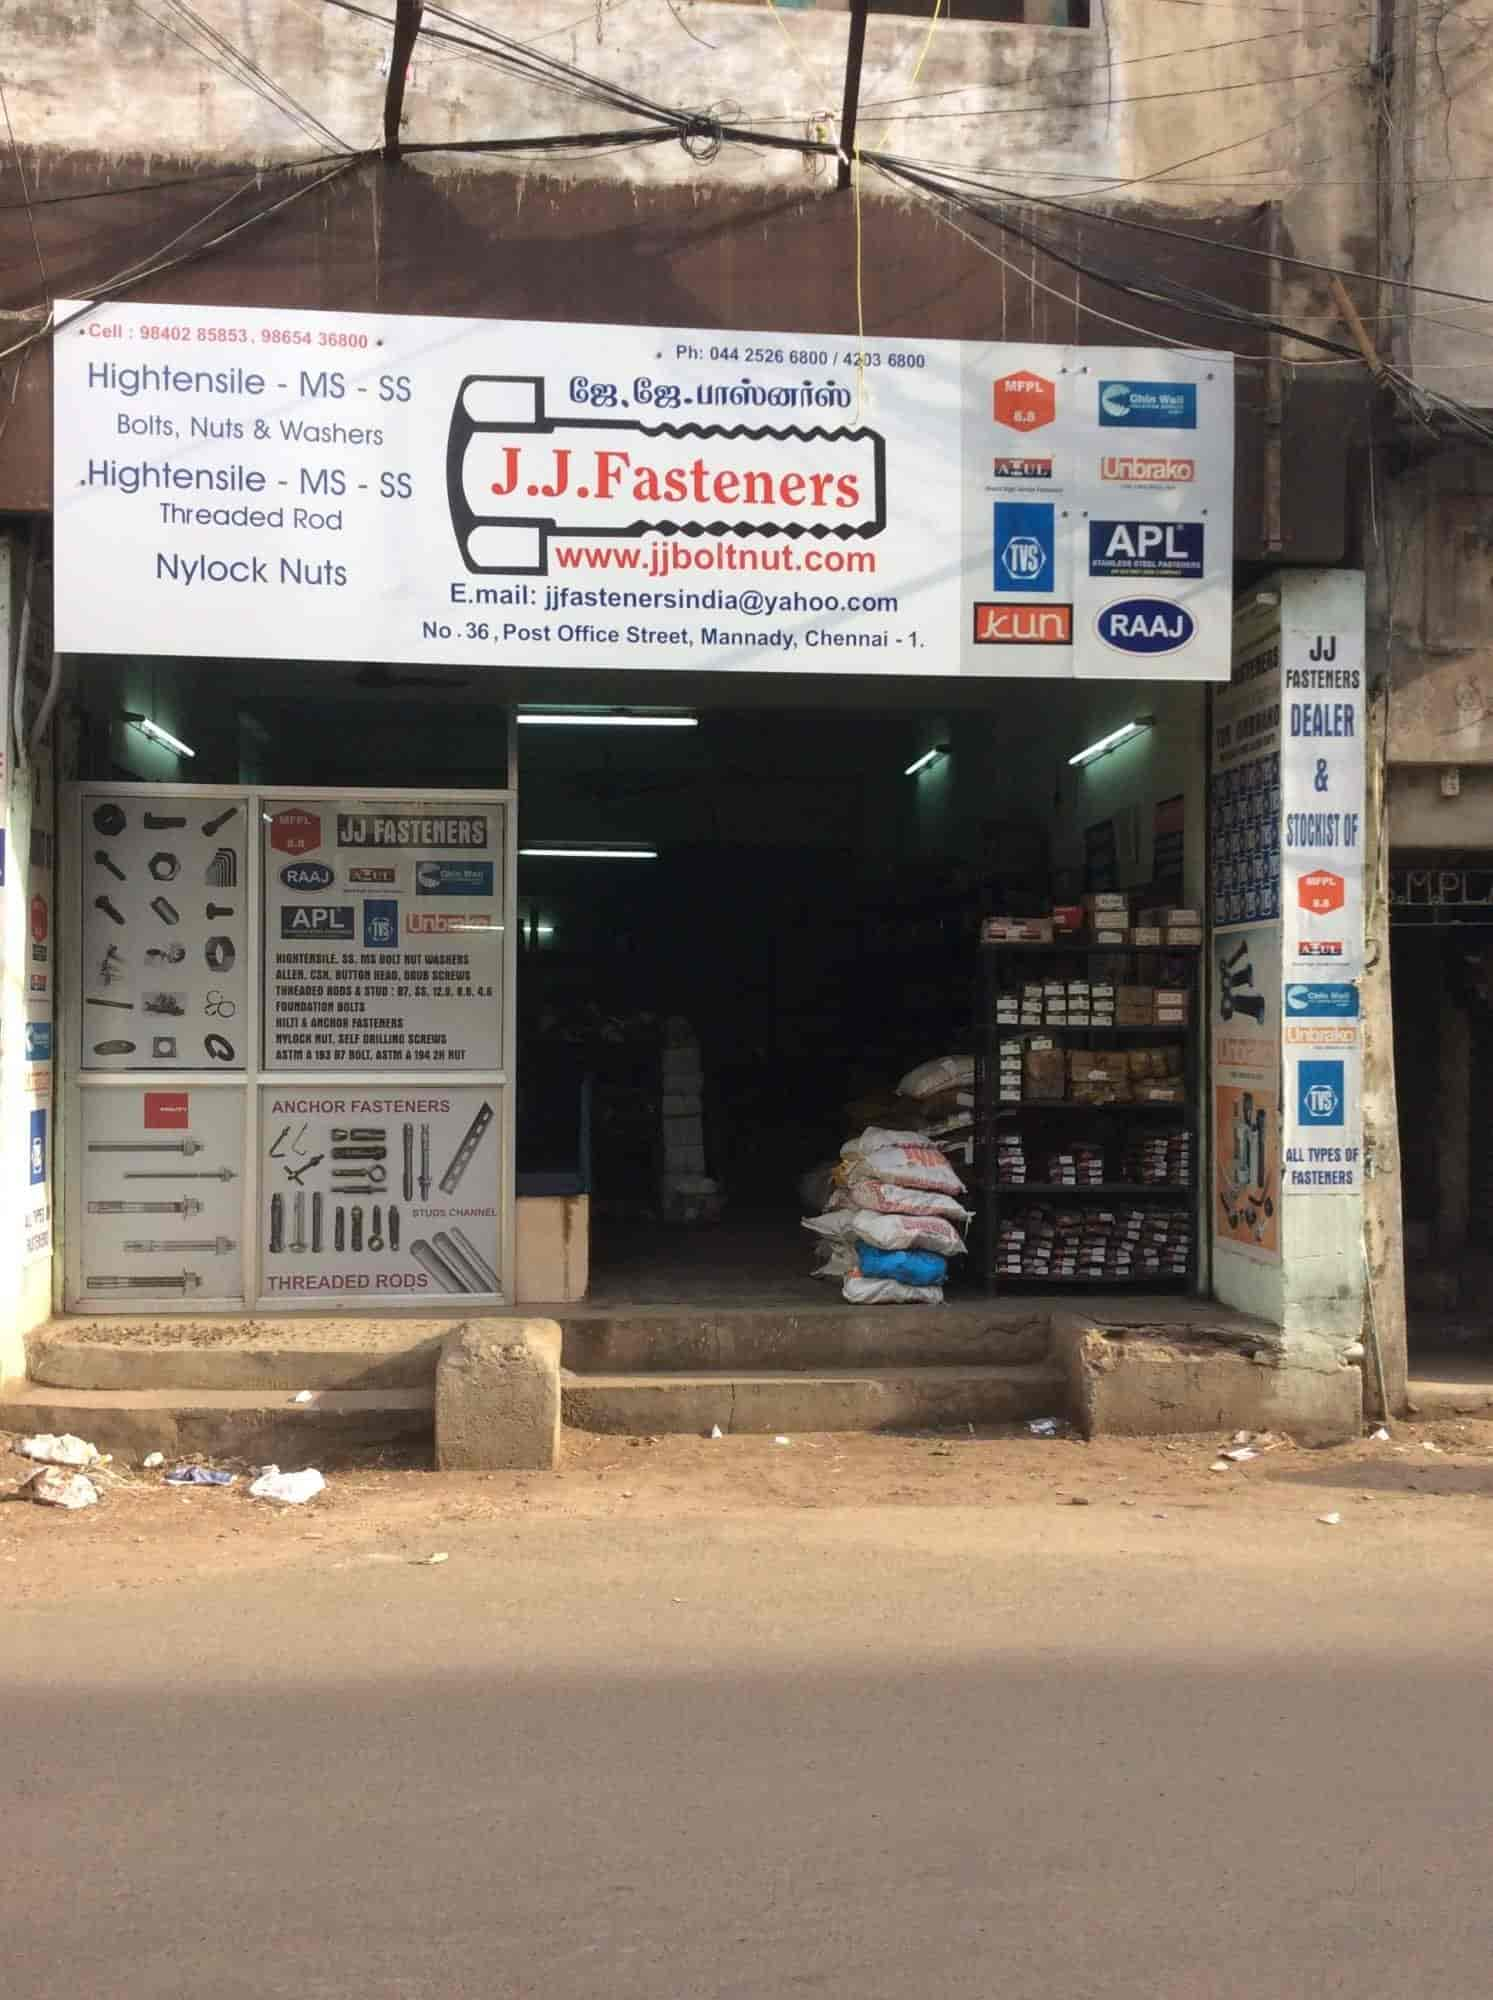 JJ Fasteners, Parrys - Fastener Dealers in Chennai - Justdial